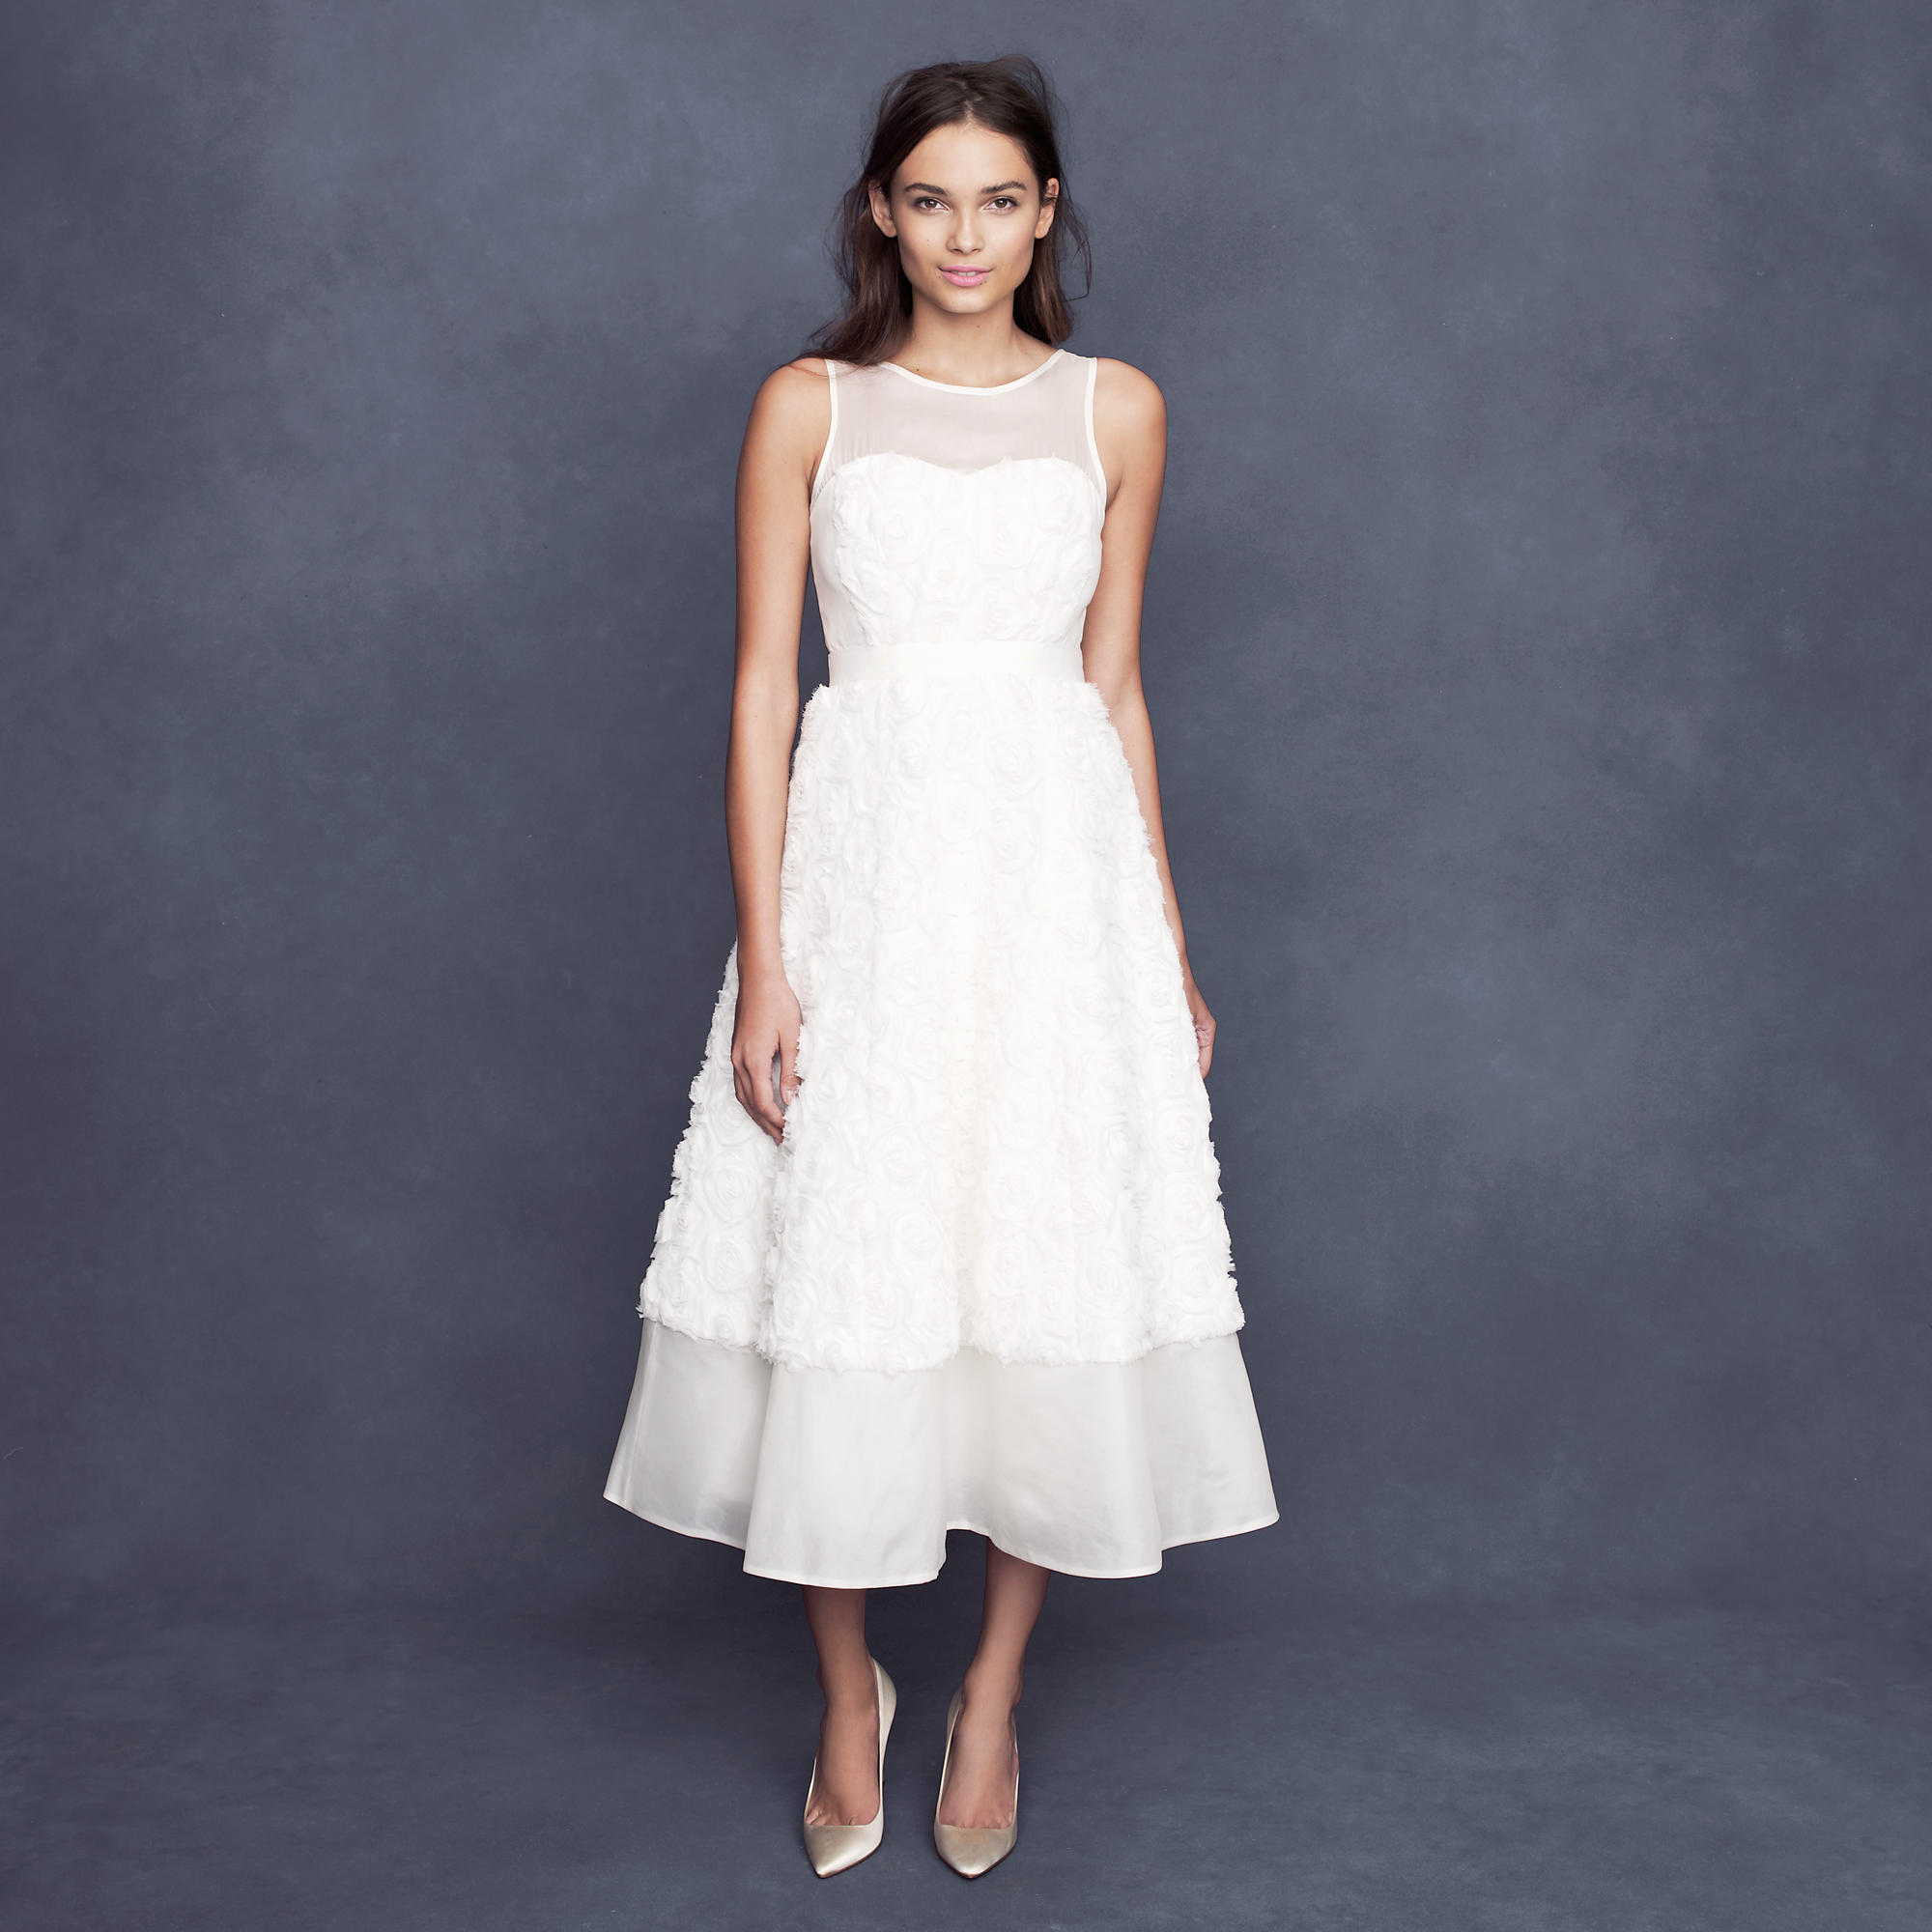 J Crew Bridesmaids Dress Choice Image - Braidsmaid Dress, Cocktail ...